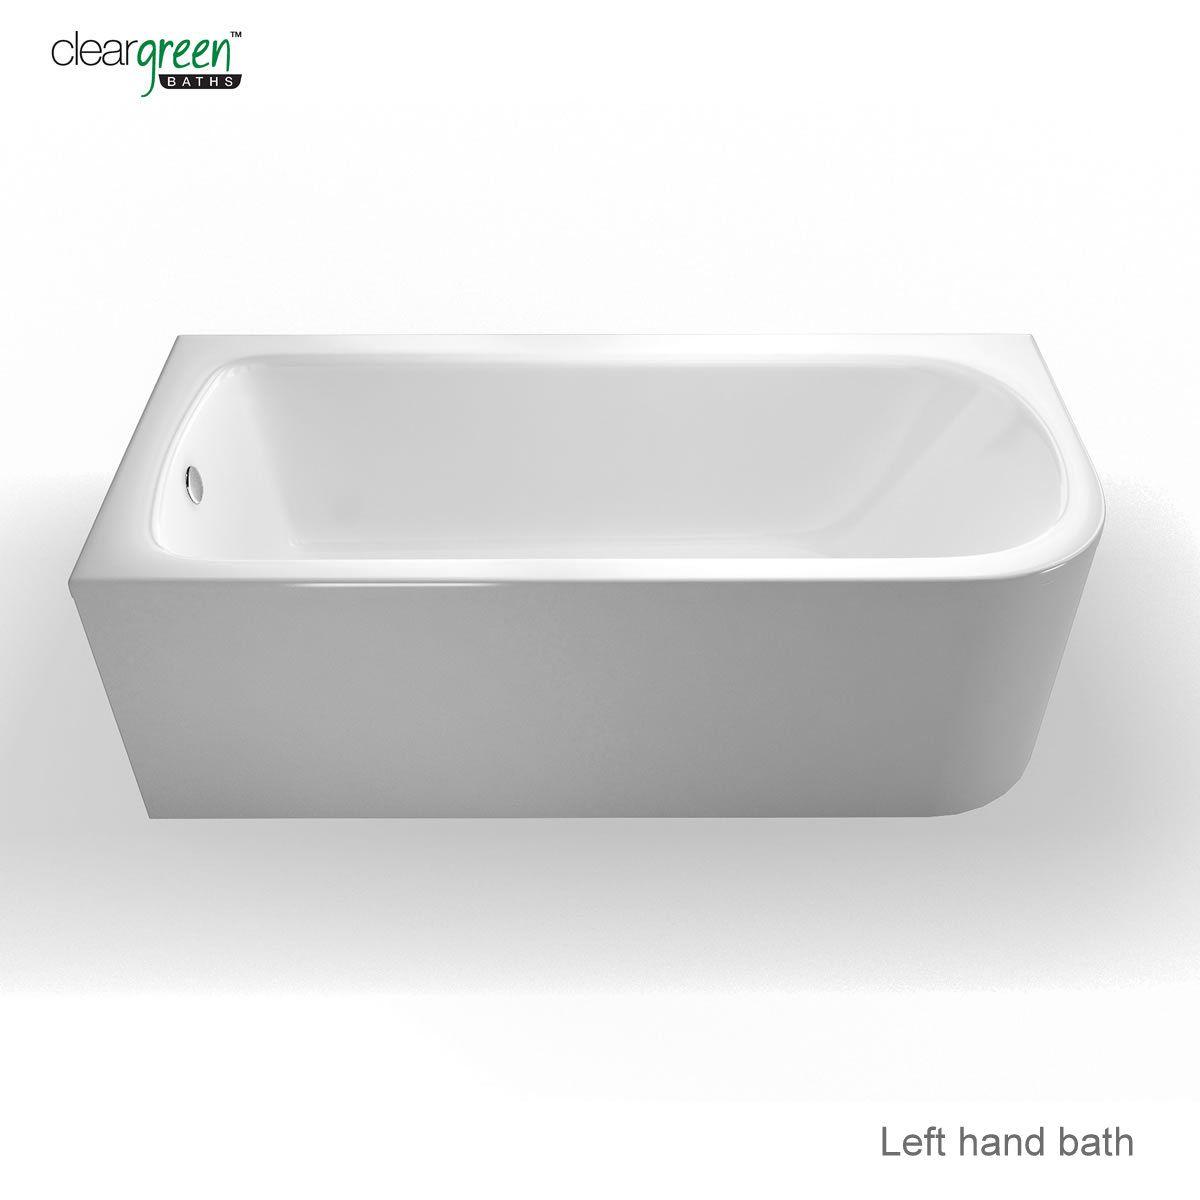 cleargreen viride offset bath uk bathrooms twyford indulgence 1600 x 500 1000mm offset corner shower